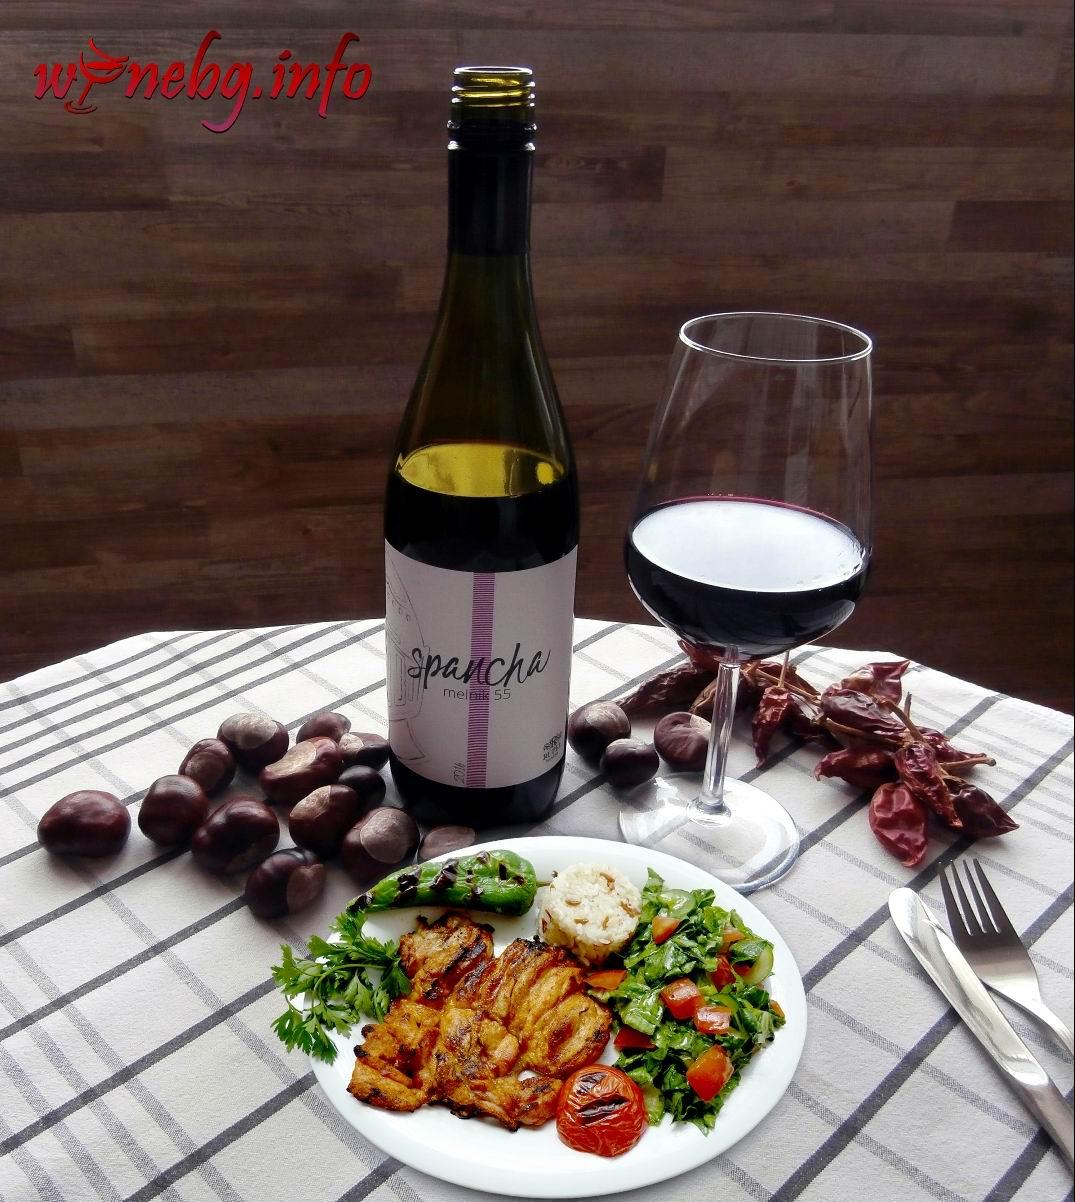 Spancha Melnik 55 Rupel Winery 2016